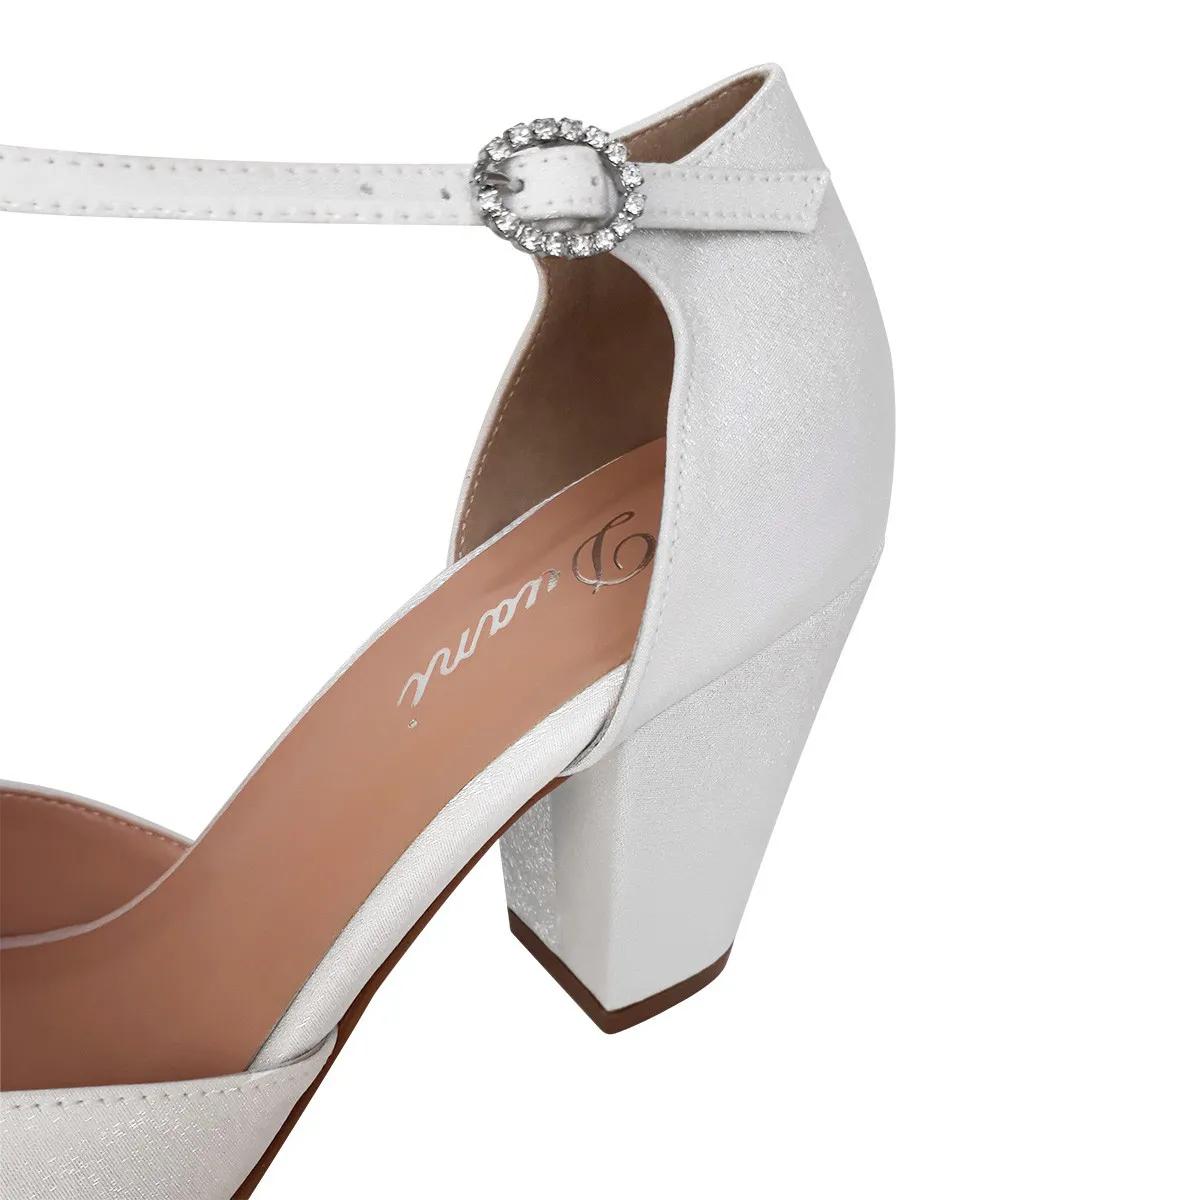 Sandalia Branca Noiva Casamento Salto Medio Grosso confortavel